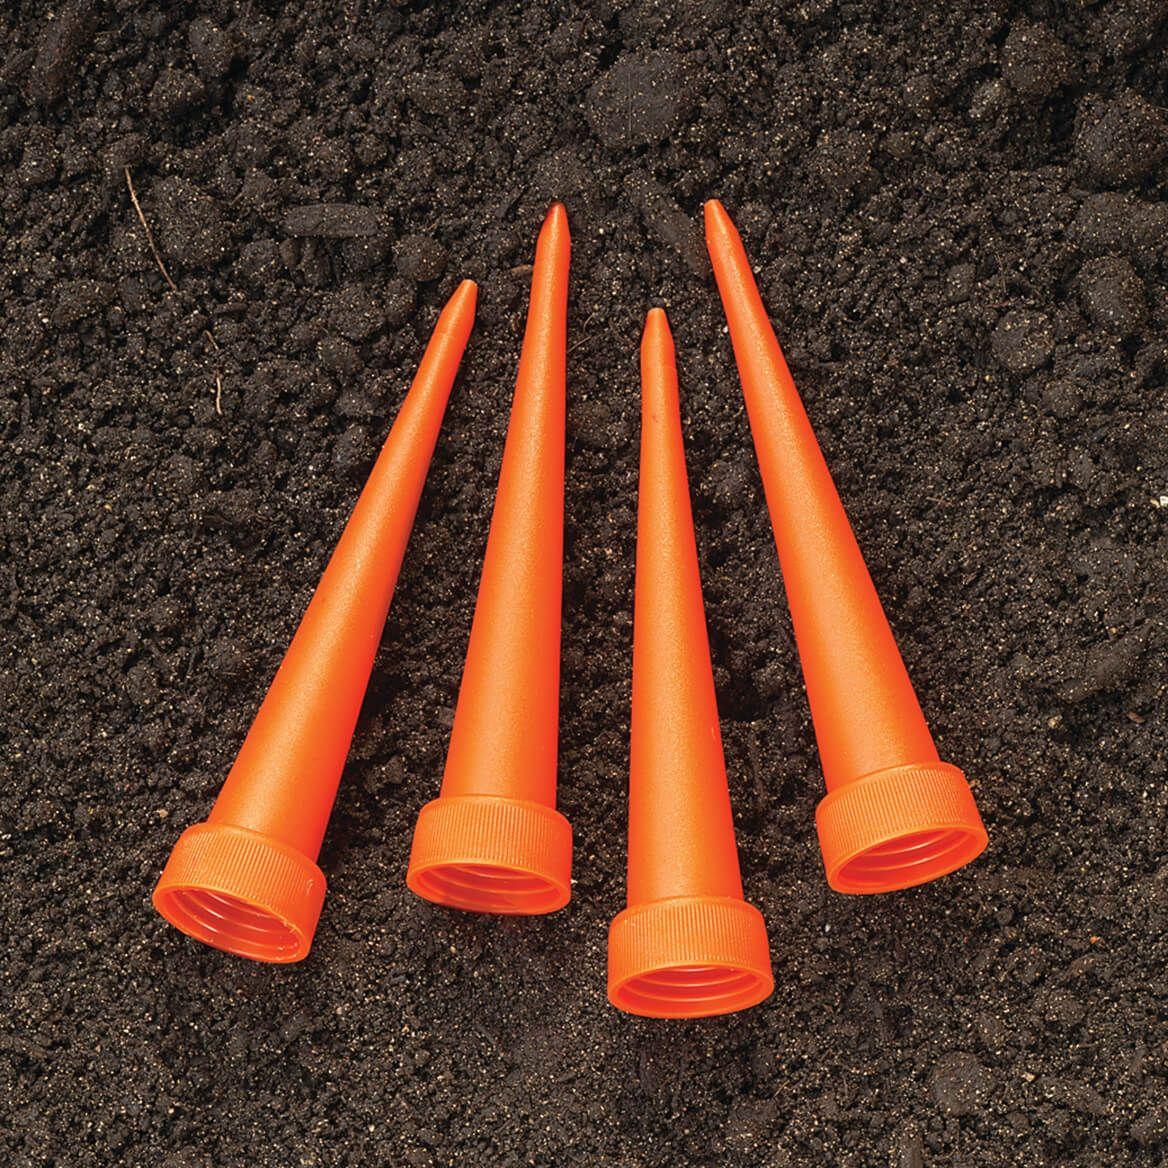 Irrigation Spikes Set of 8-371295